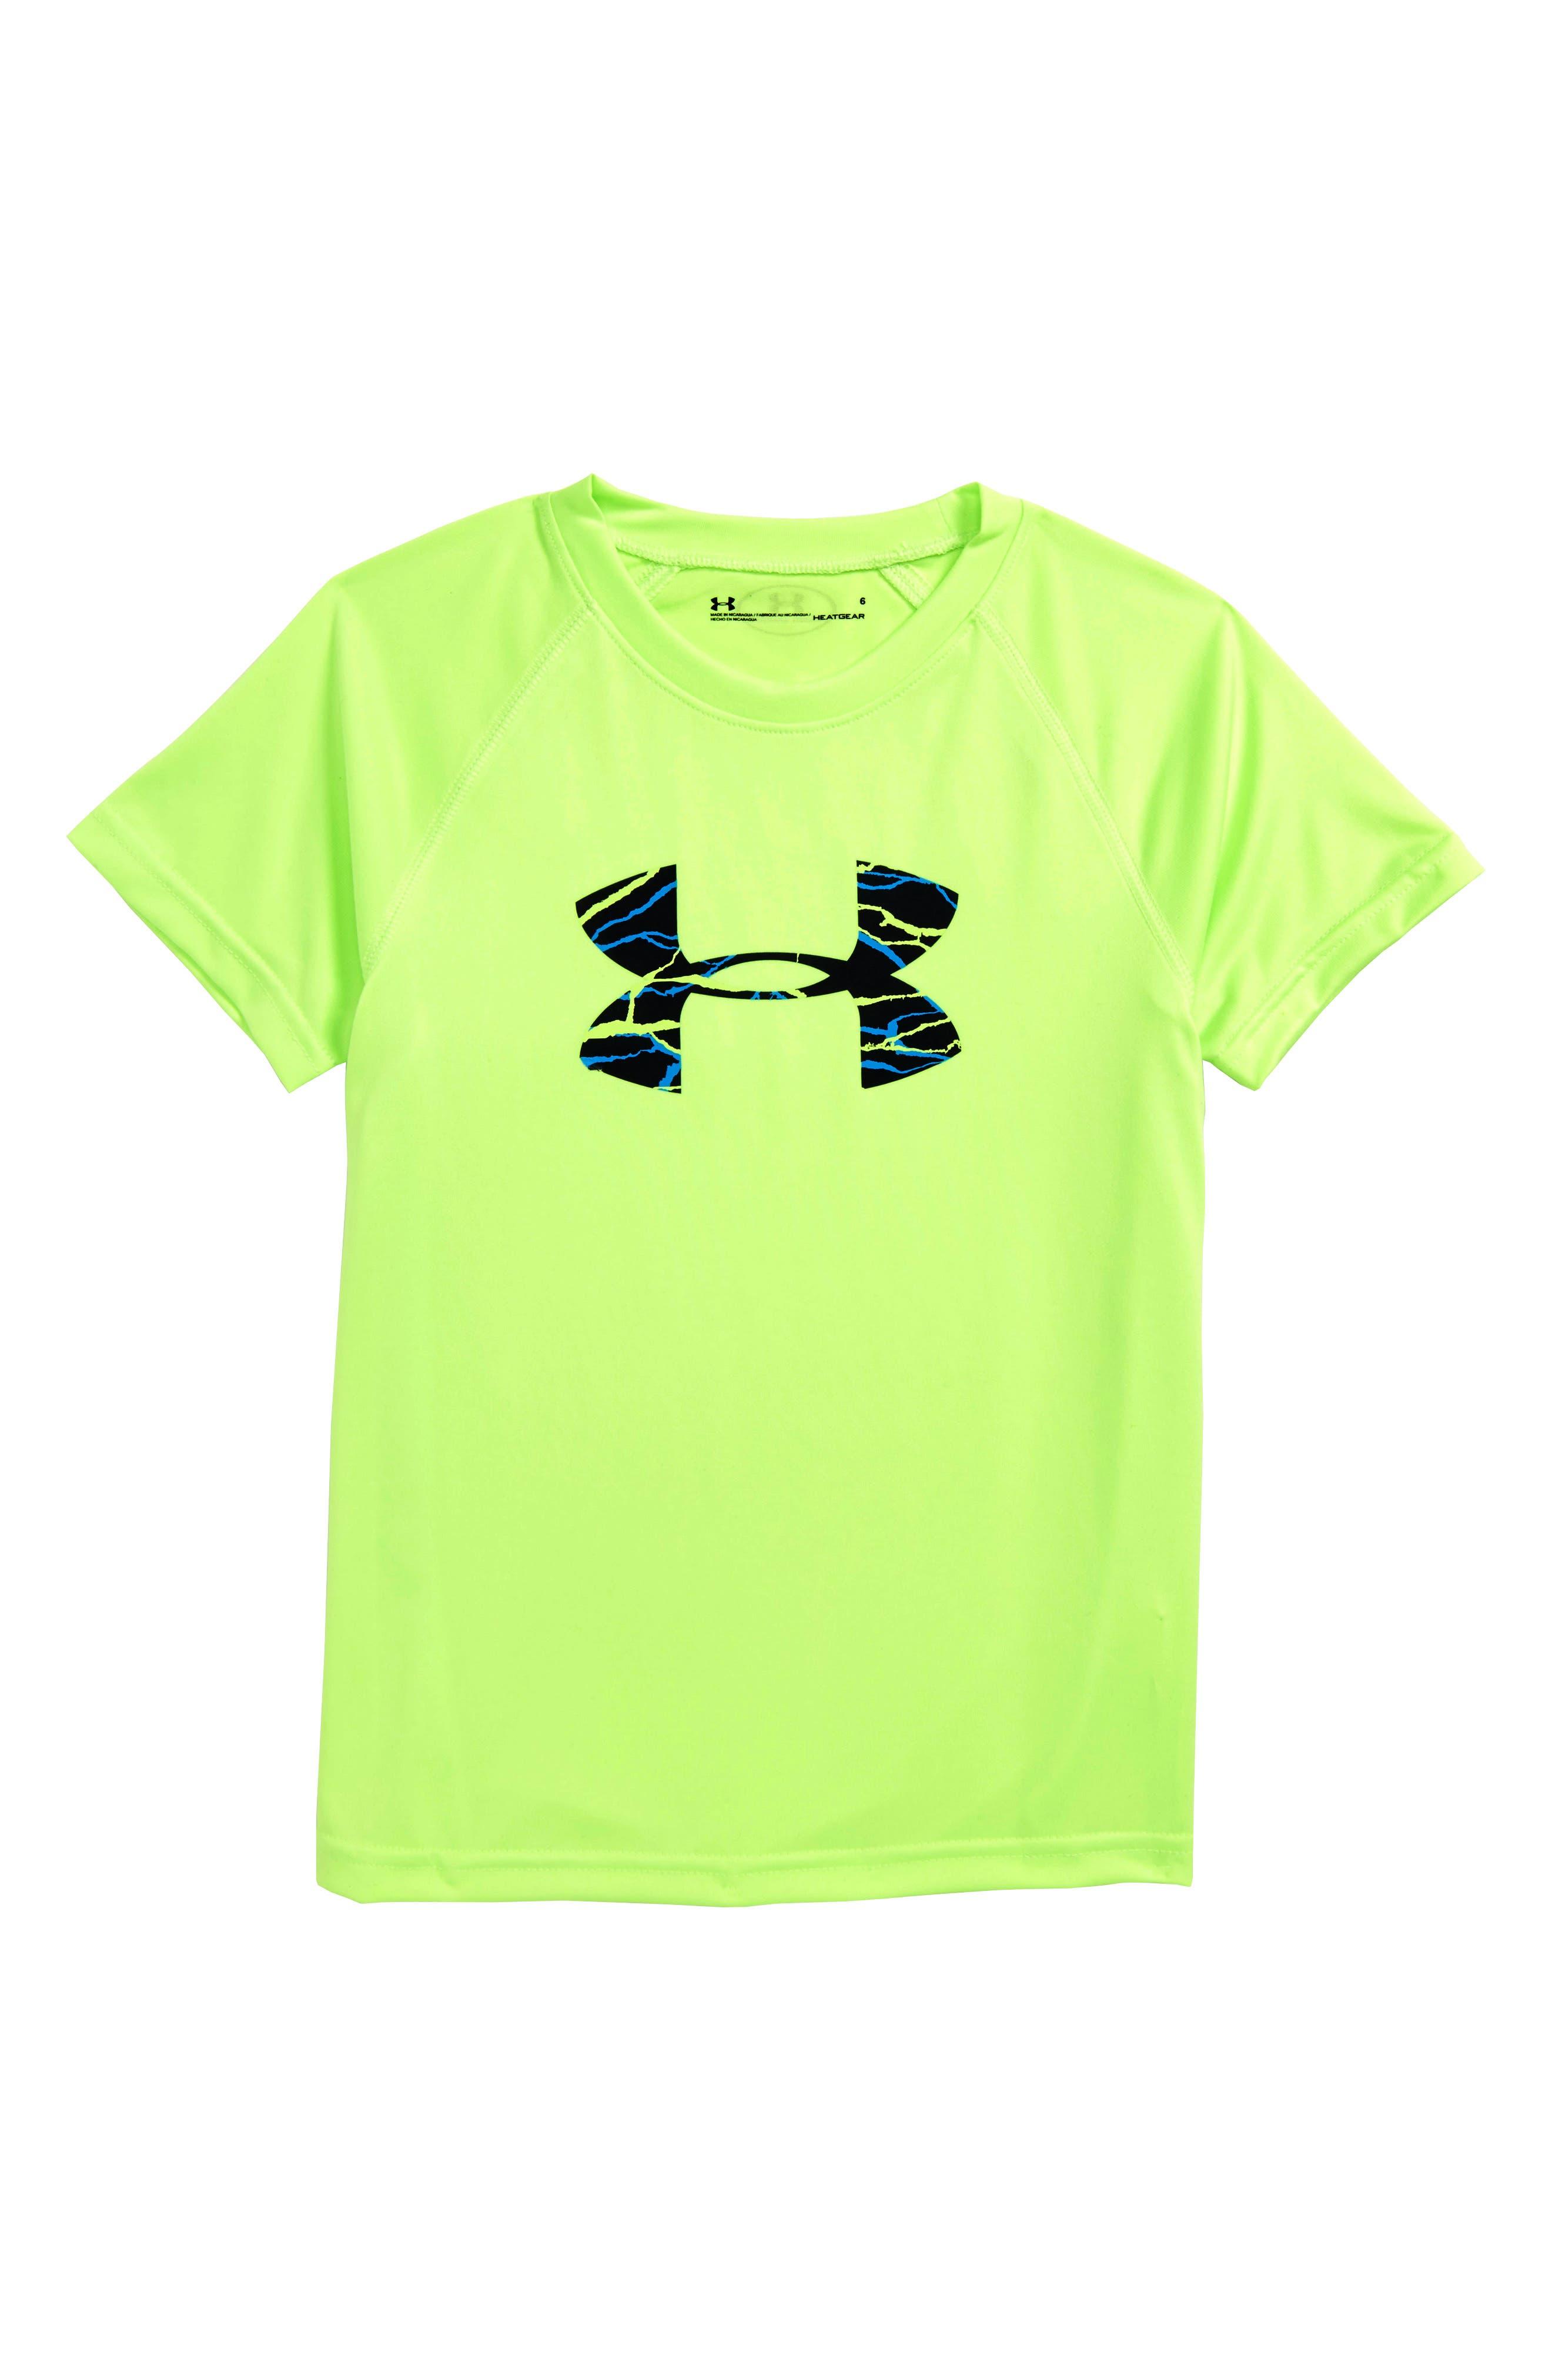 Under Armour Voltage Graphic HeatGear® T-Shirt (Toddler Boys & Little Boys)